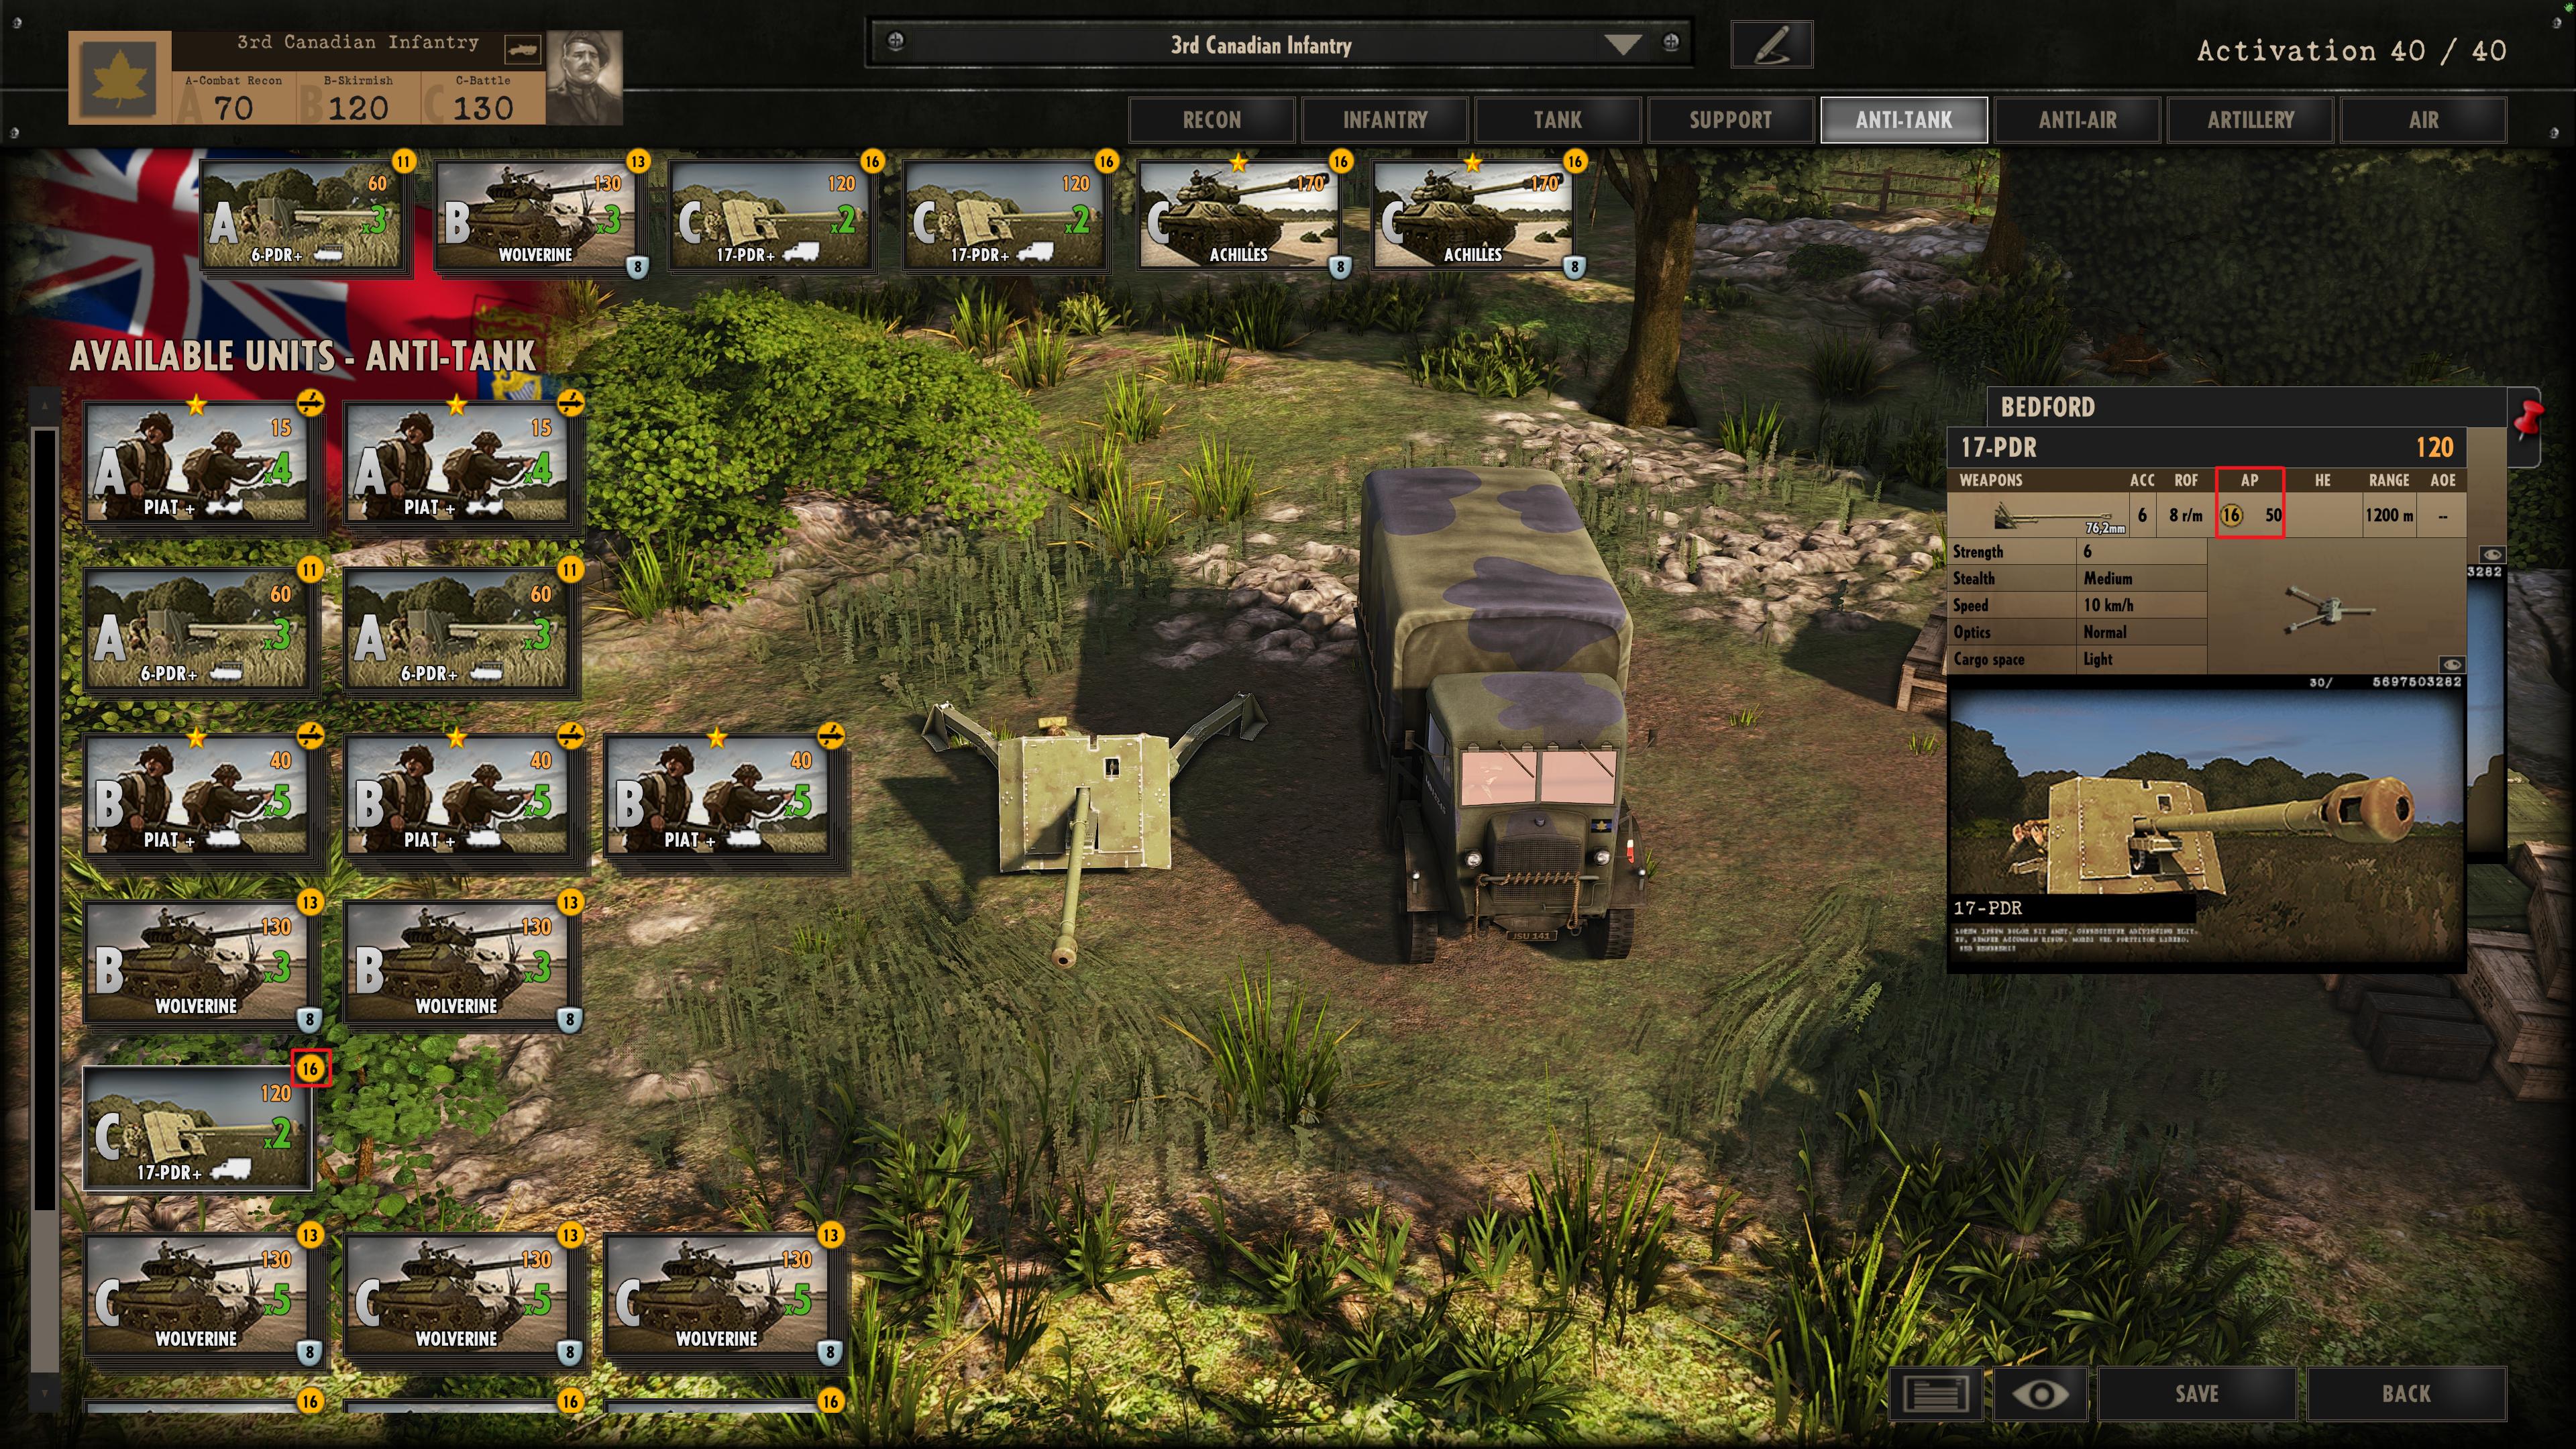 Steel Division: Normandy 44 - Anti-Tank Gameplay AP